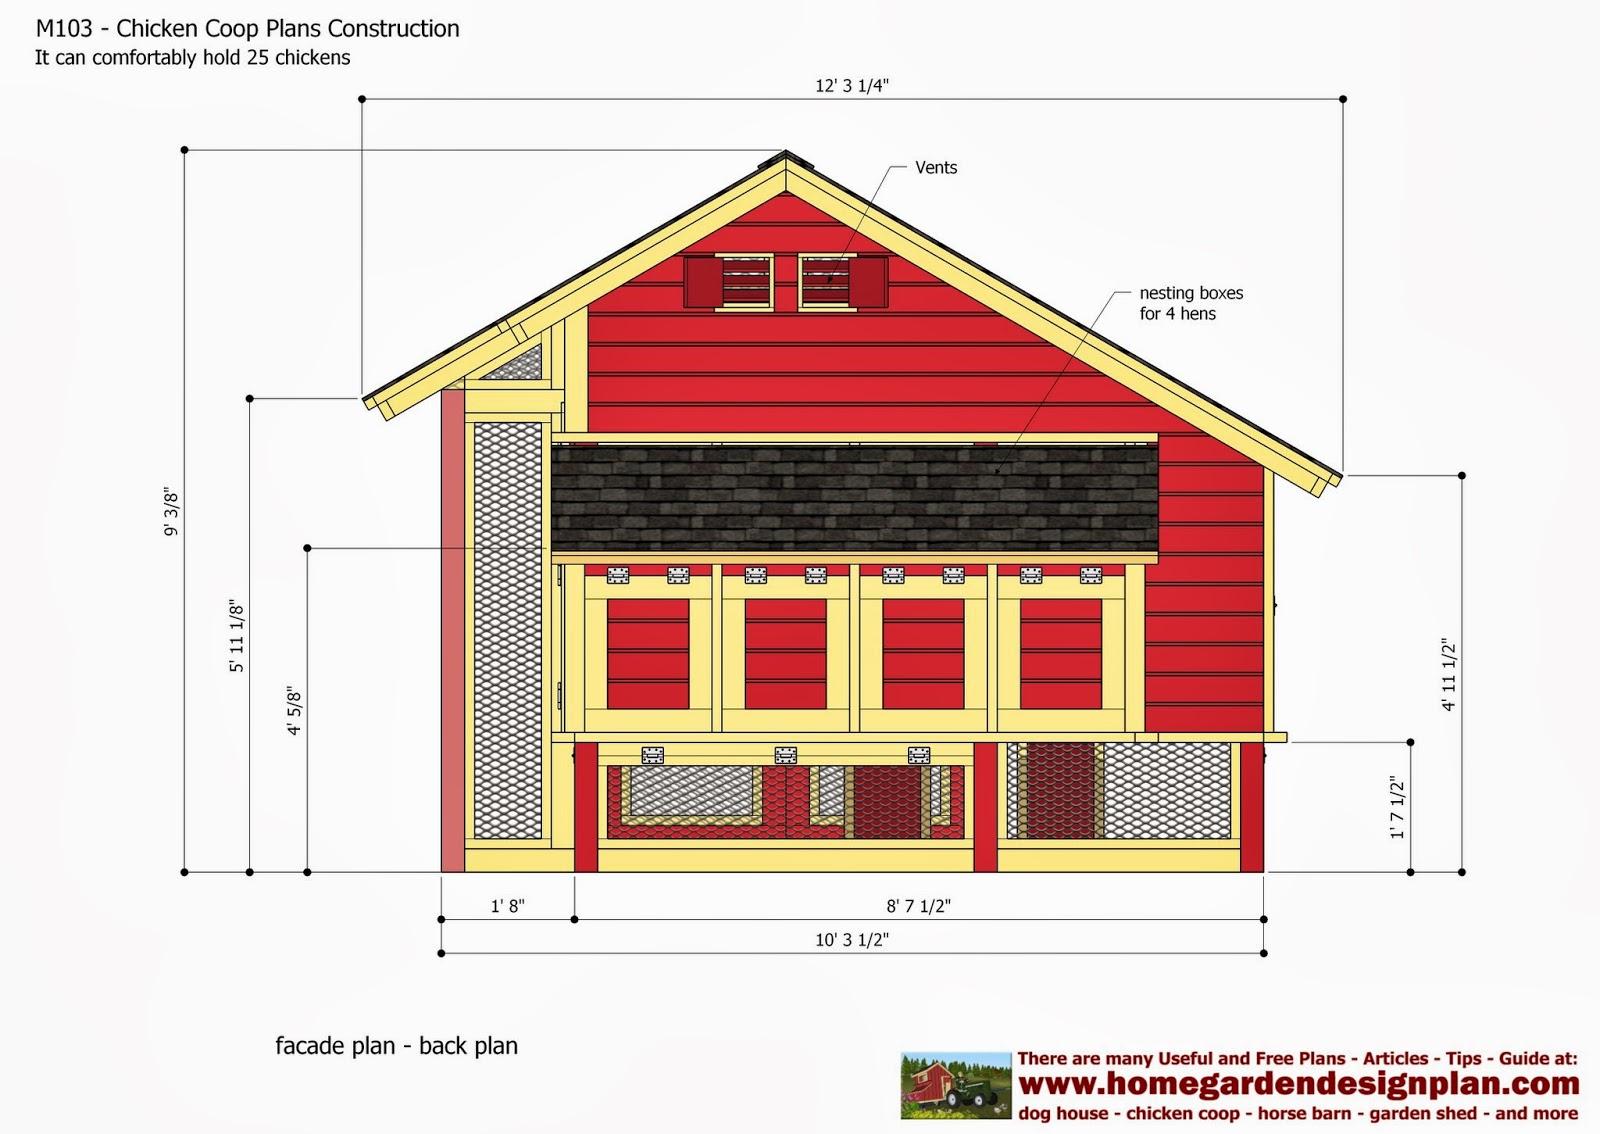 Home garden plans m103 chicken coop plans construction for Chicken coop blueprints designs plans